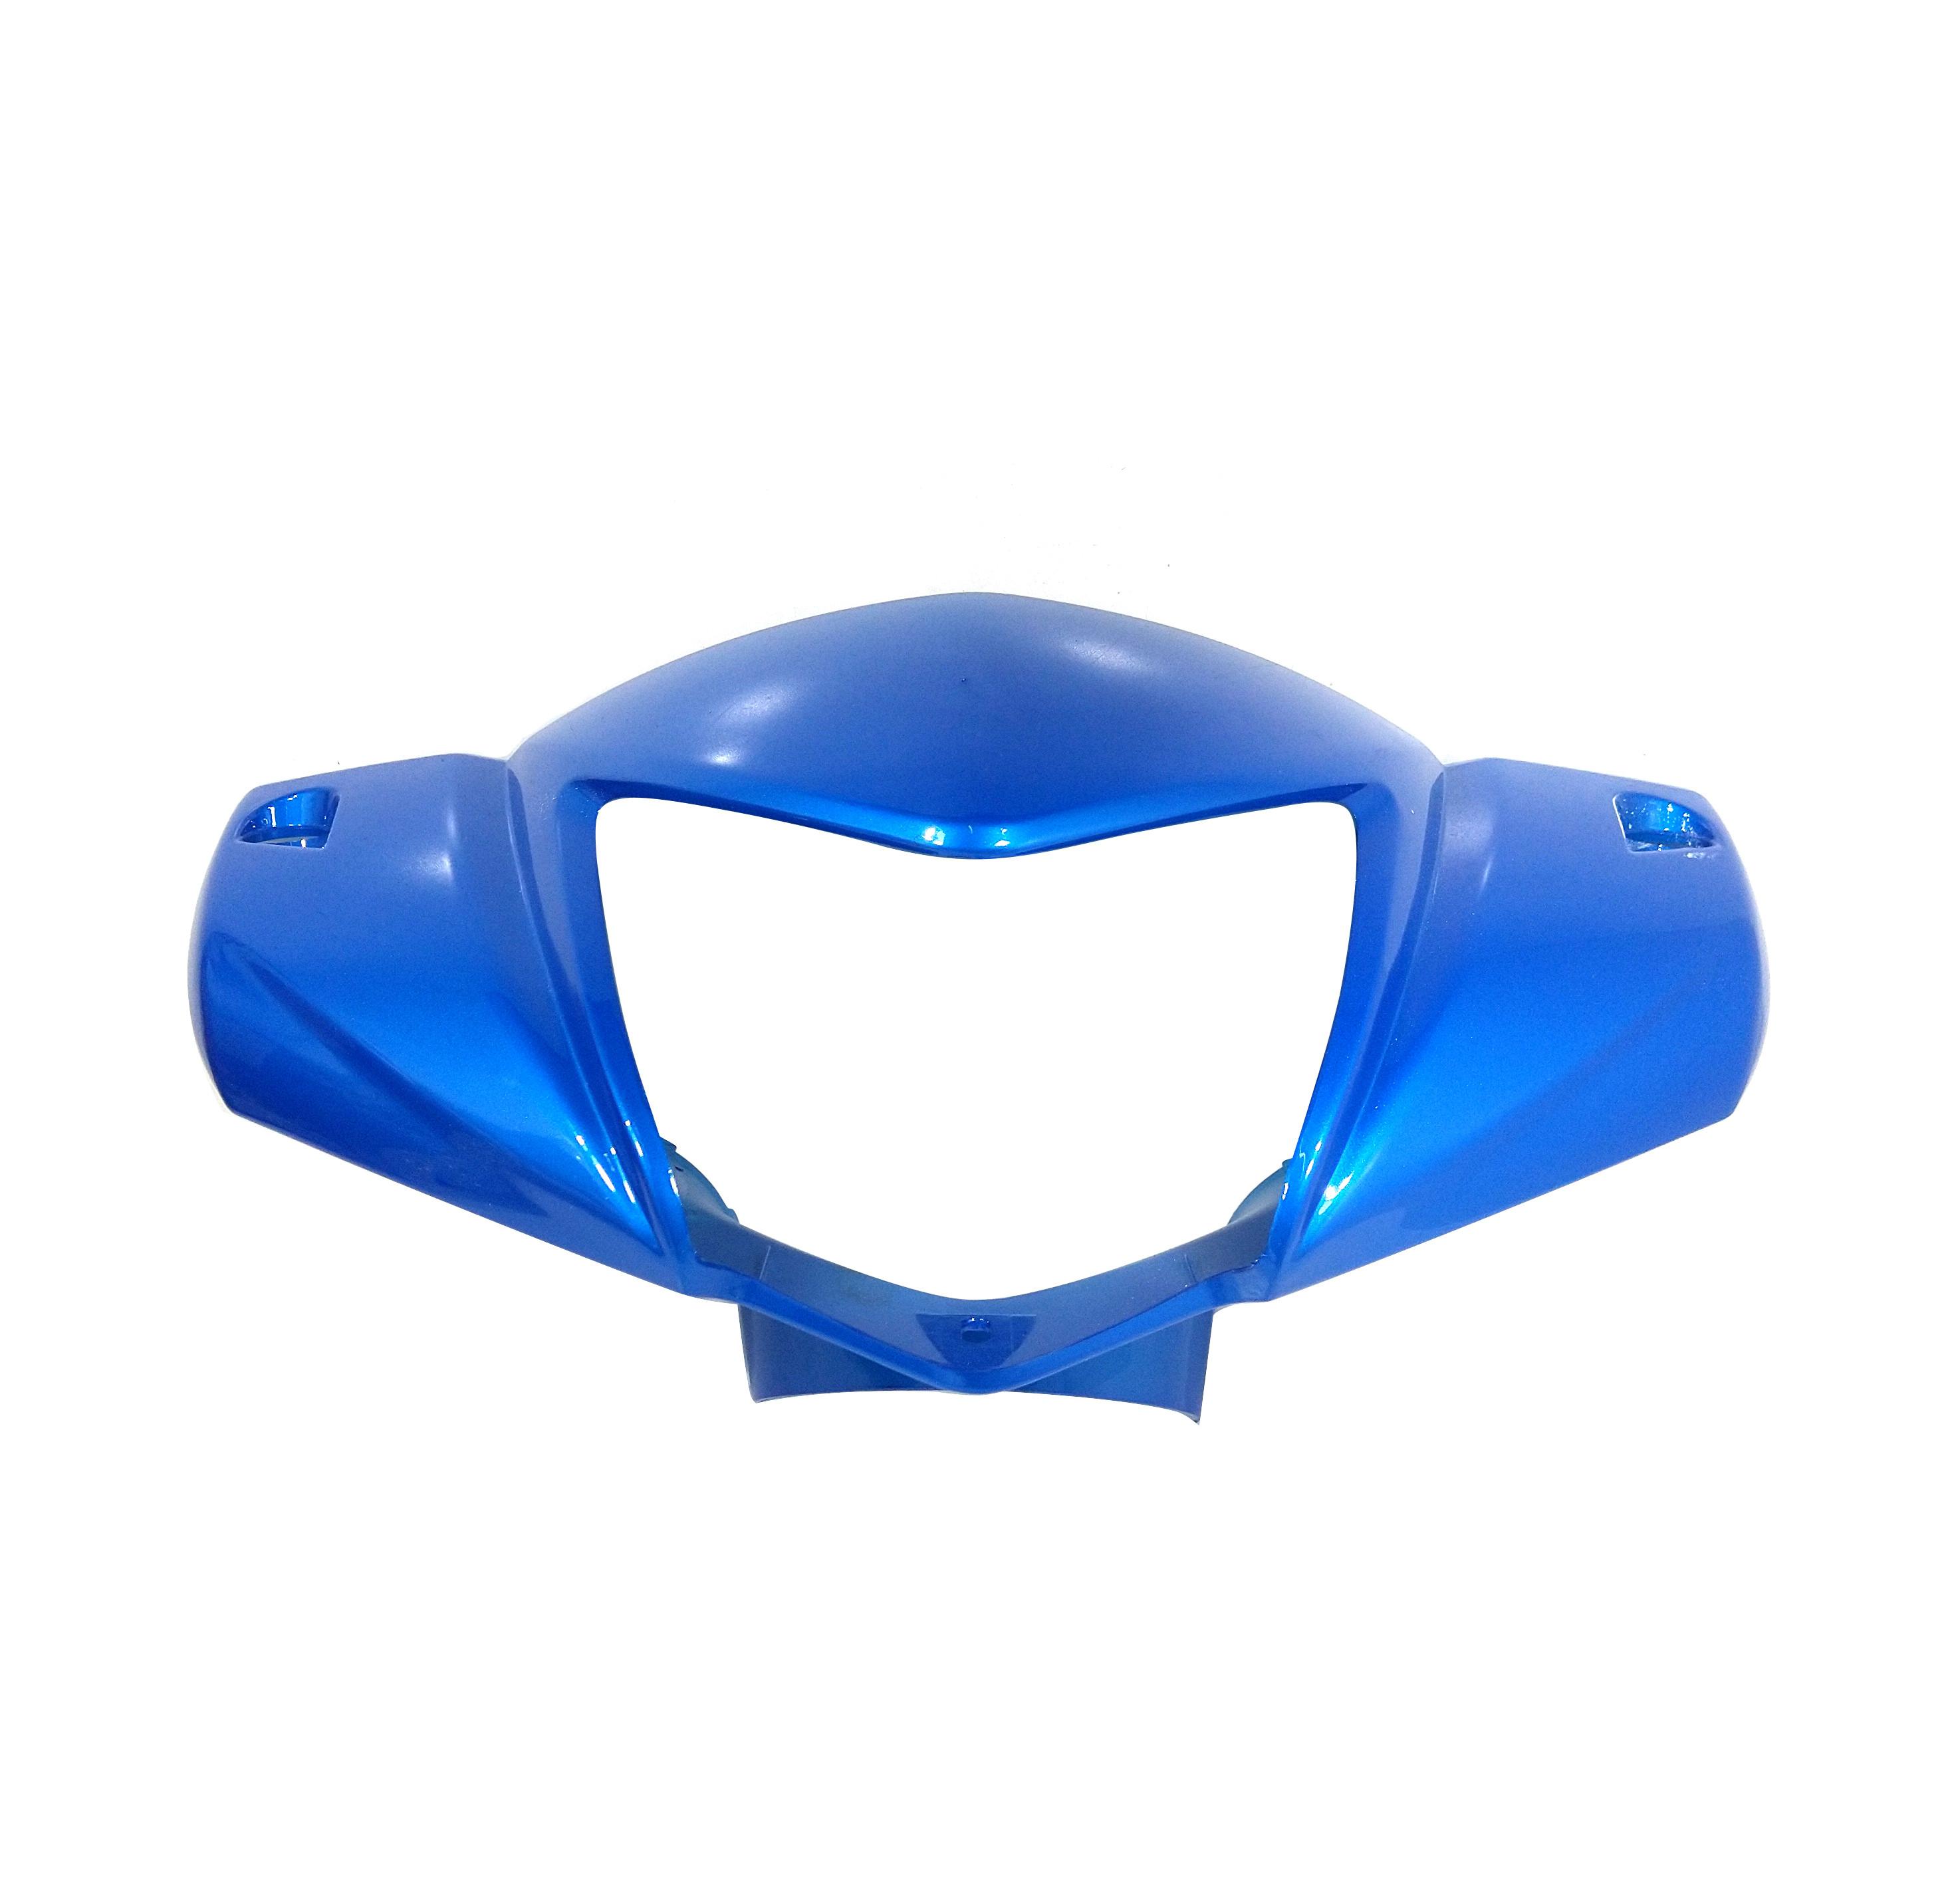 Cubre Optica Azul Corven Energy 110 S Original